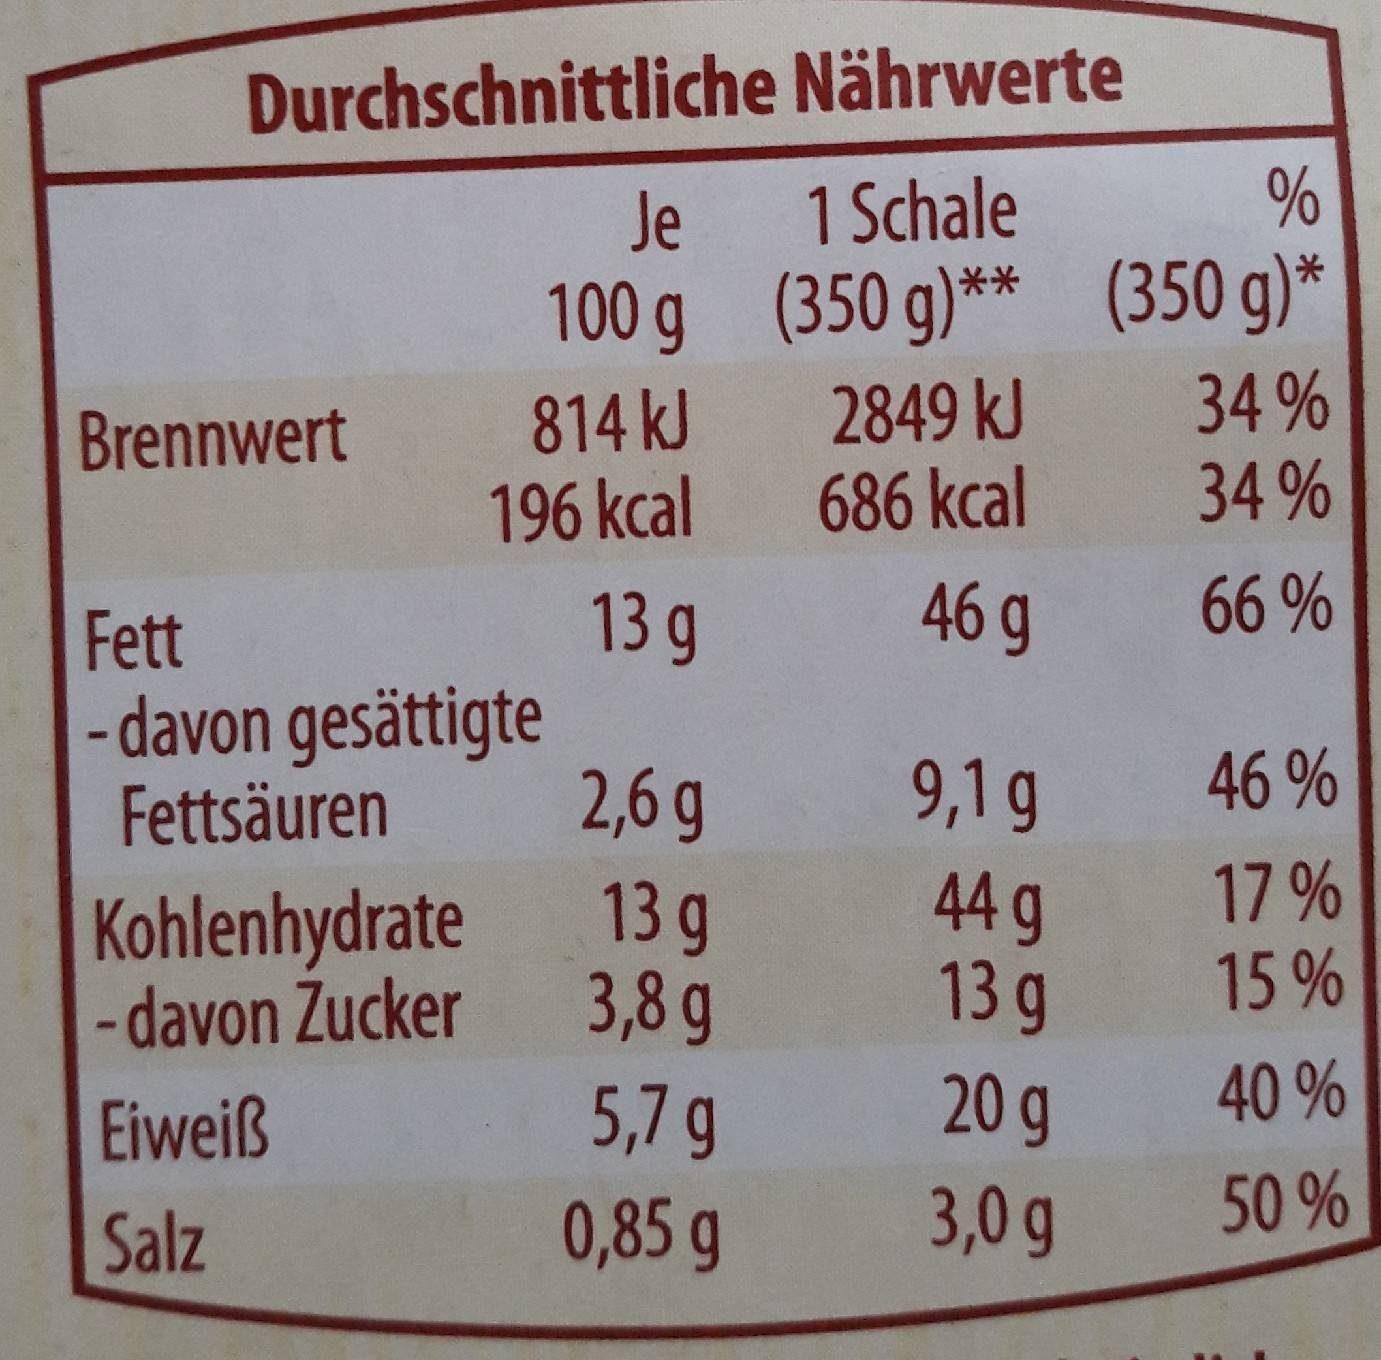 ORZO SALAT MIT KÄSE, CROUTONS UND STYLER ART DRESSING - Informations nutritionnelles - fr